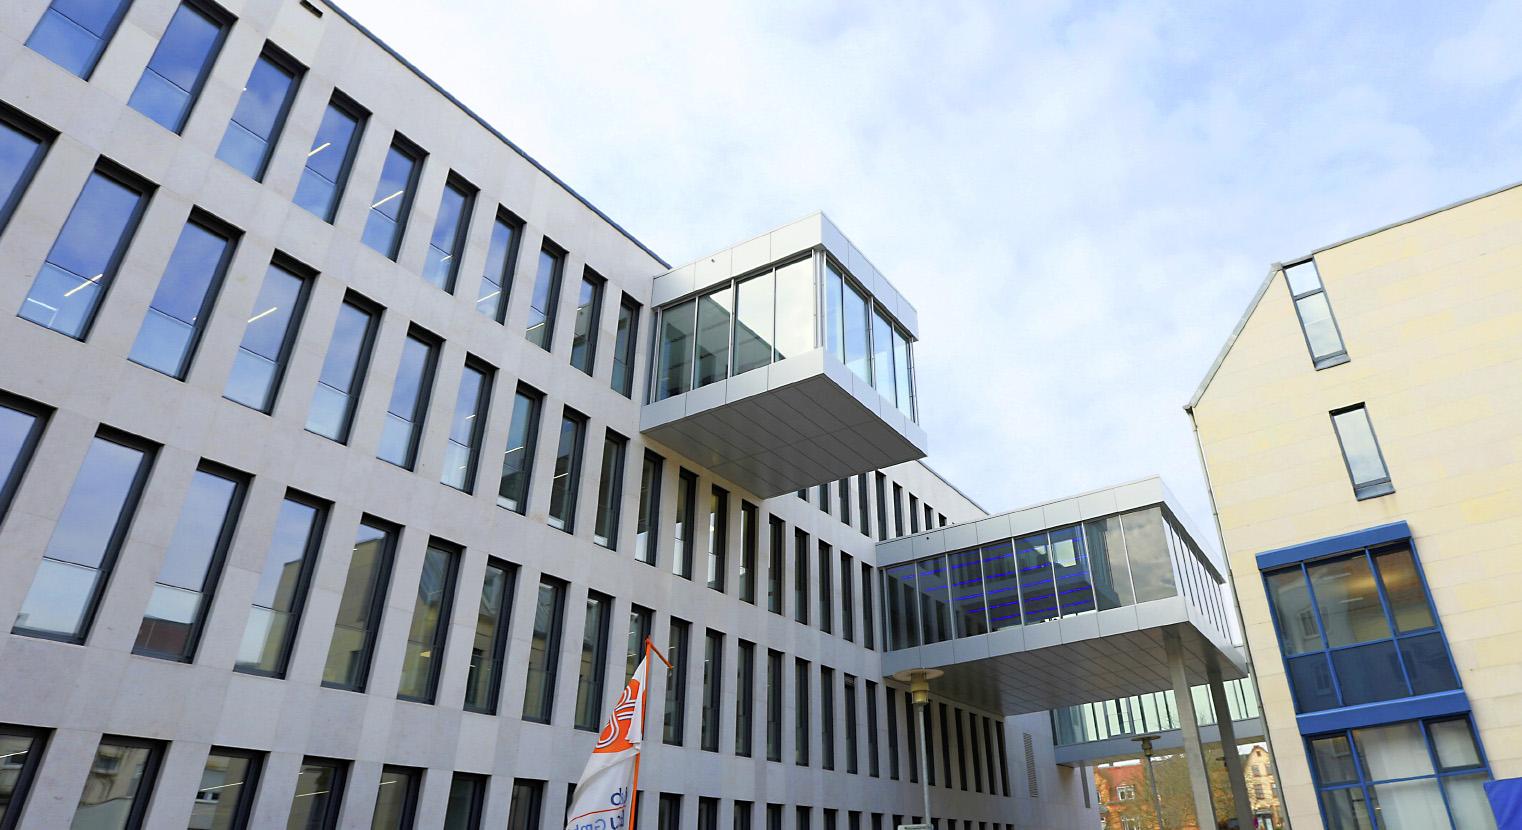 Vr Bank Sudpfalz Landau Kohl Und Frech